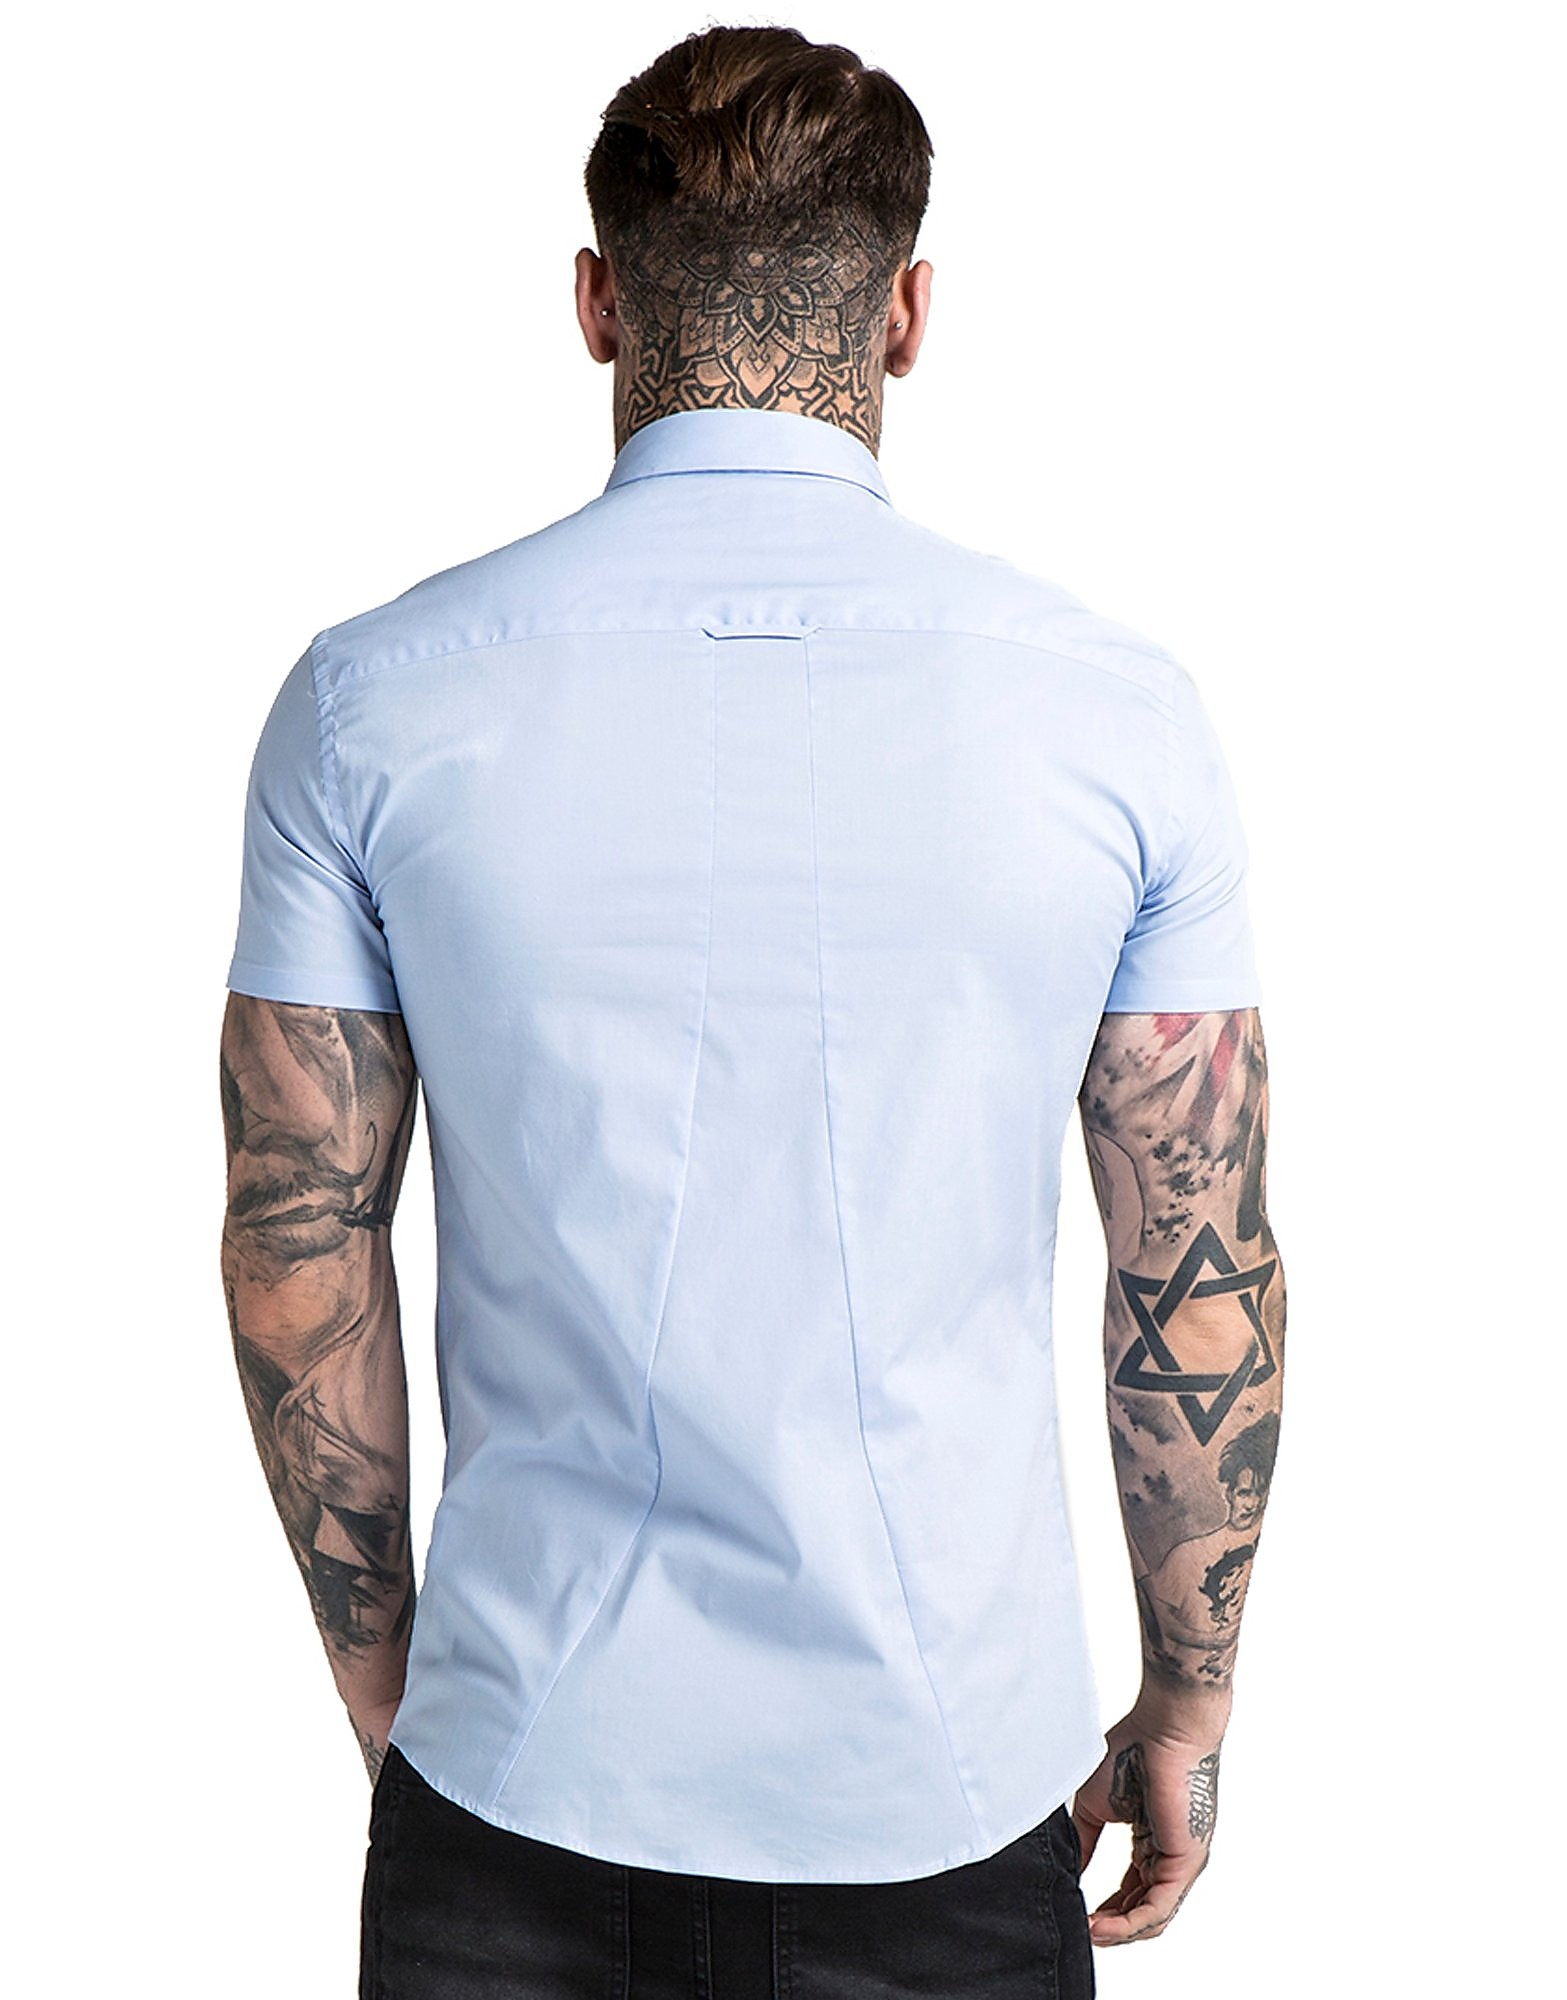 SikSilk Tab Oxford Shirt